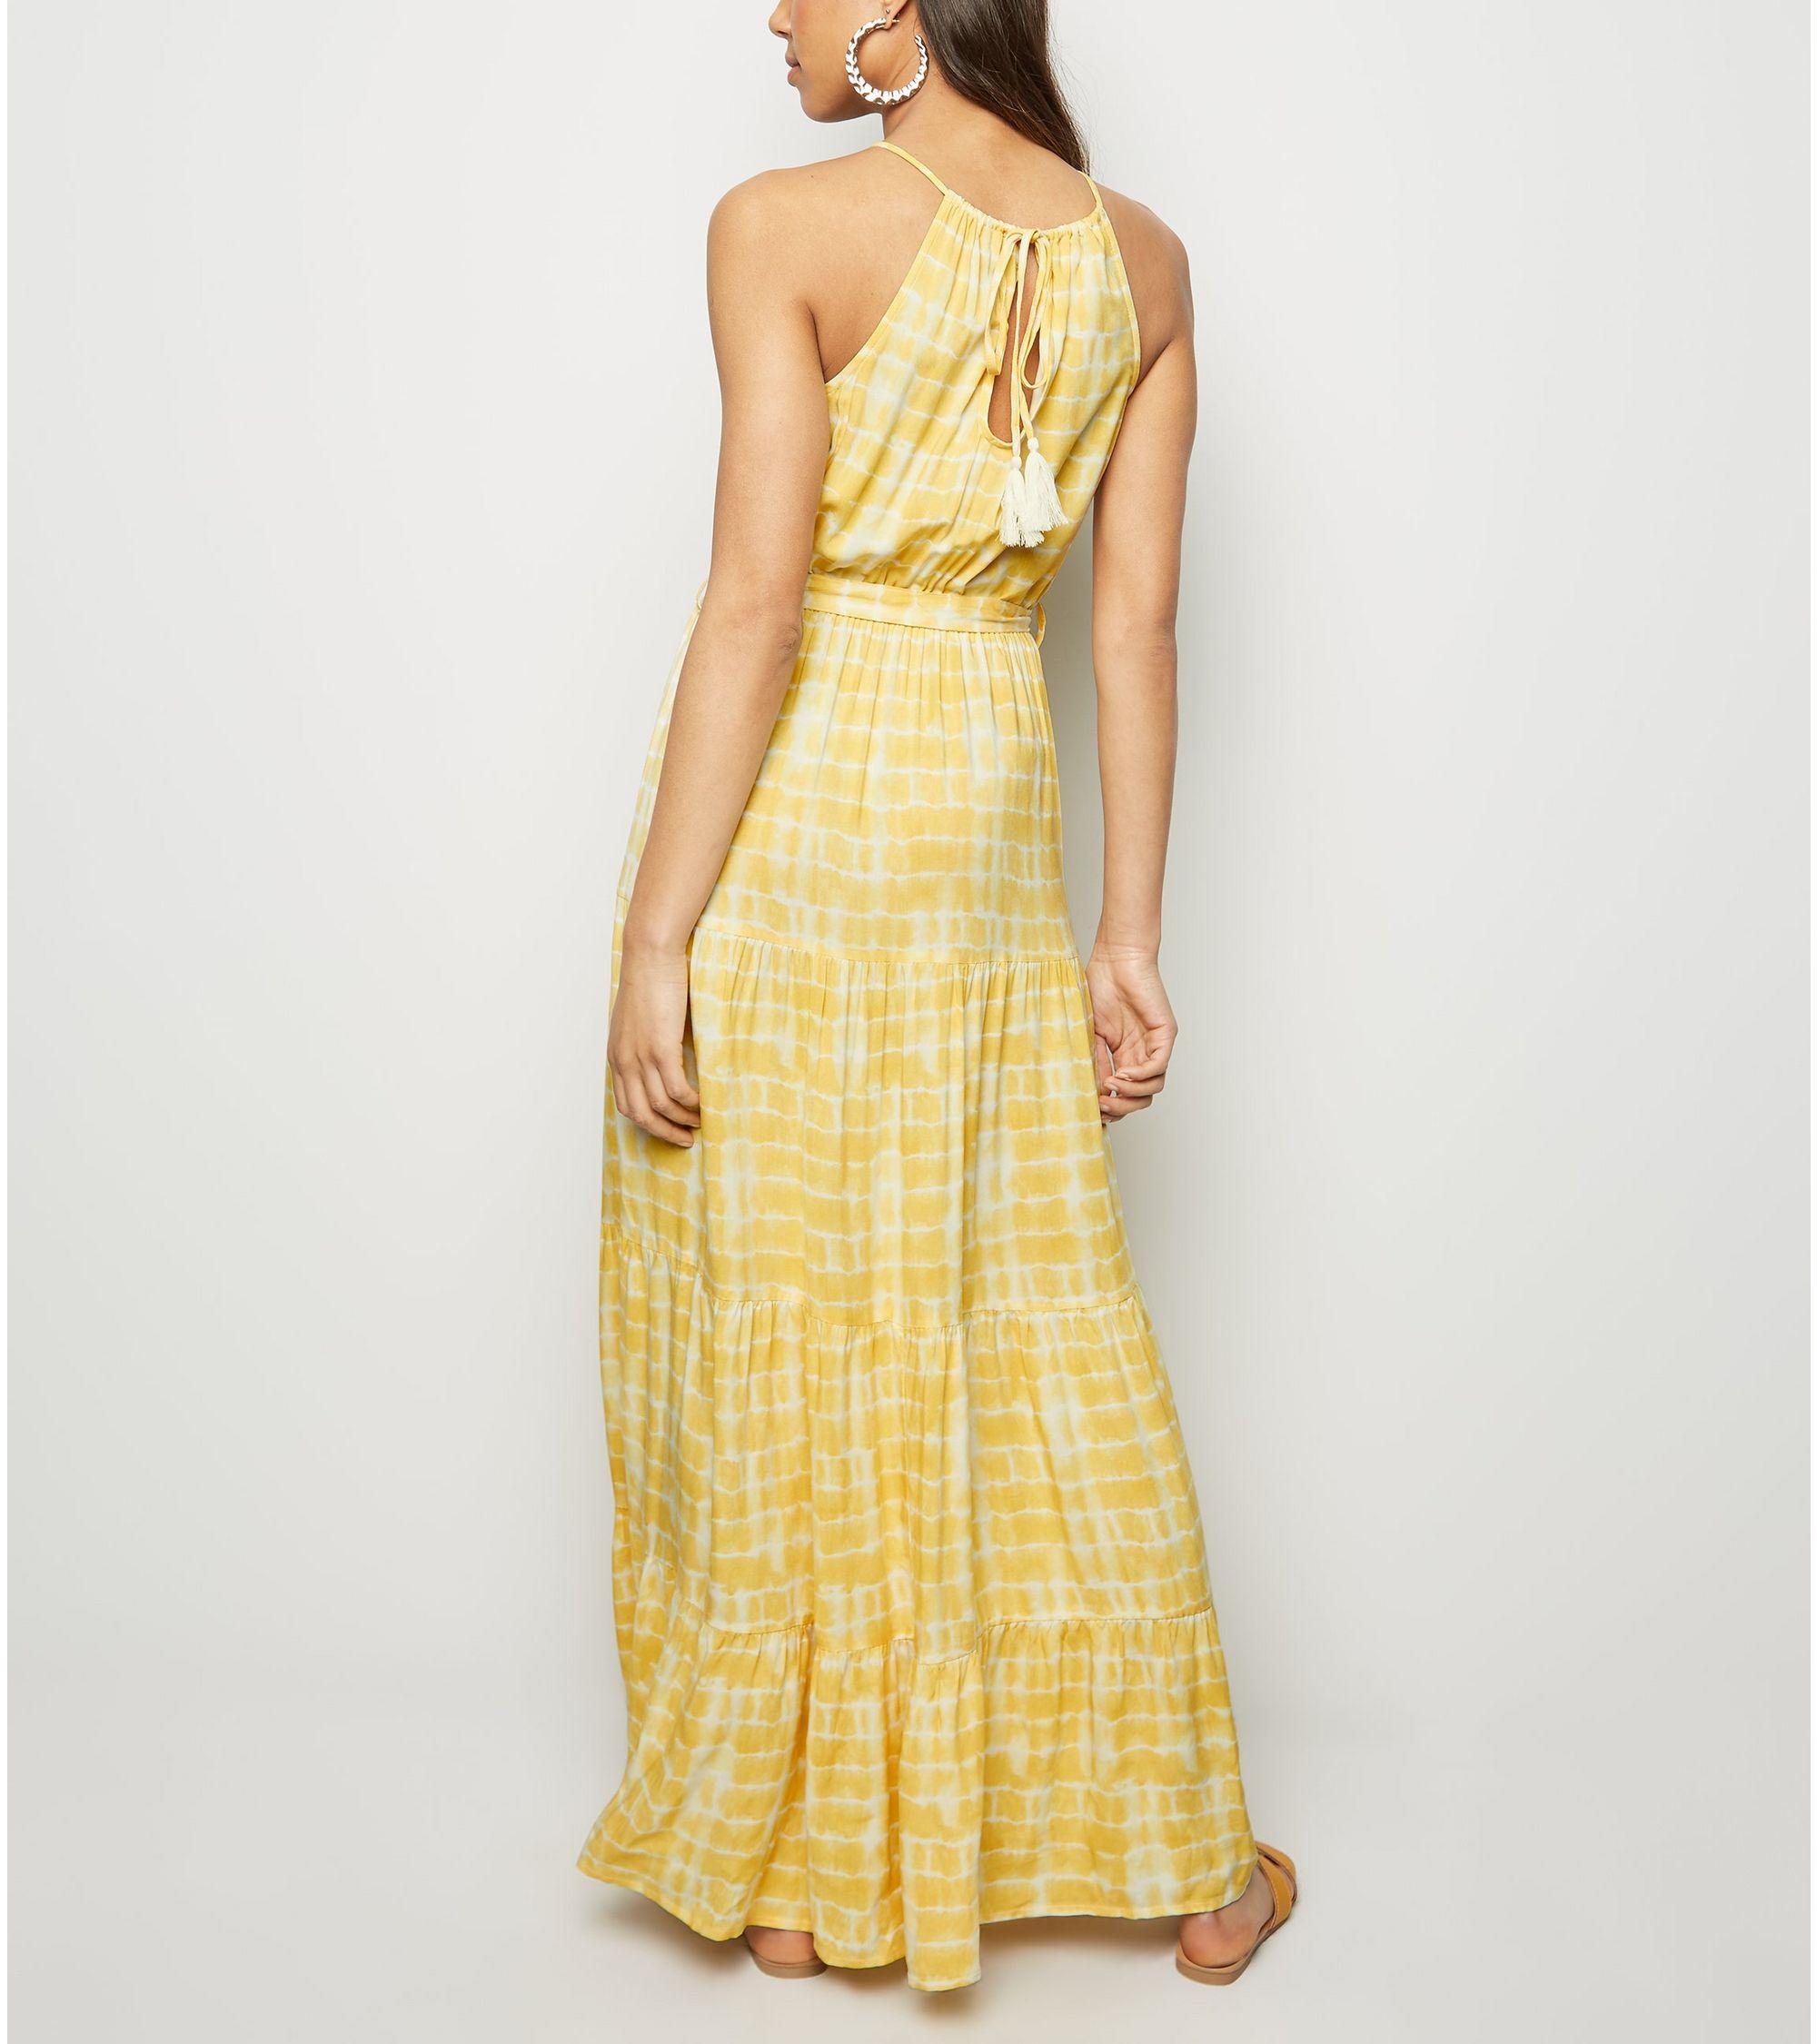 948c7cee324d New Look tie dye halterneck maxi dress at £24.99